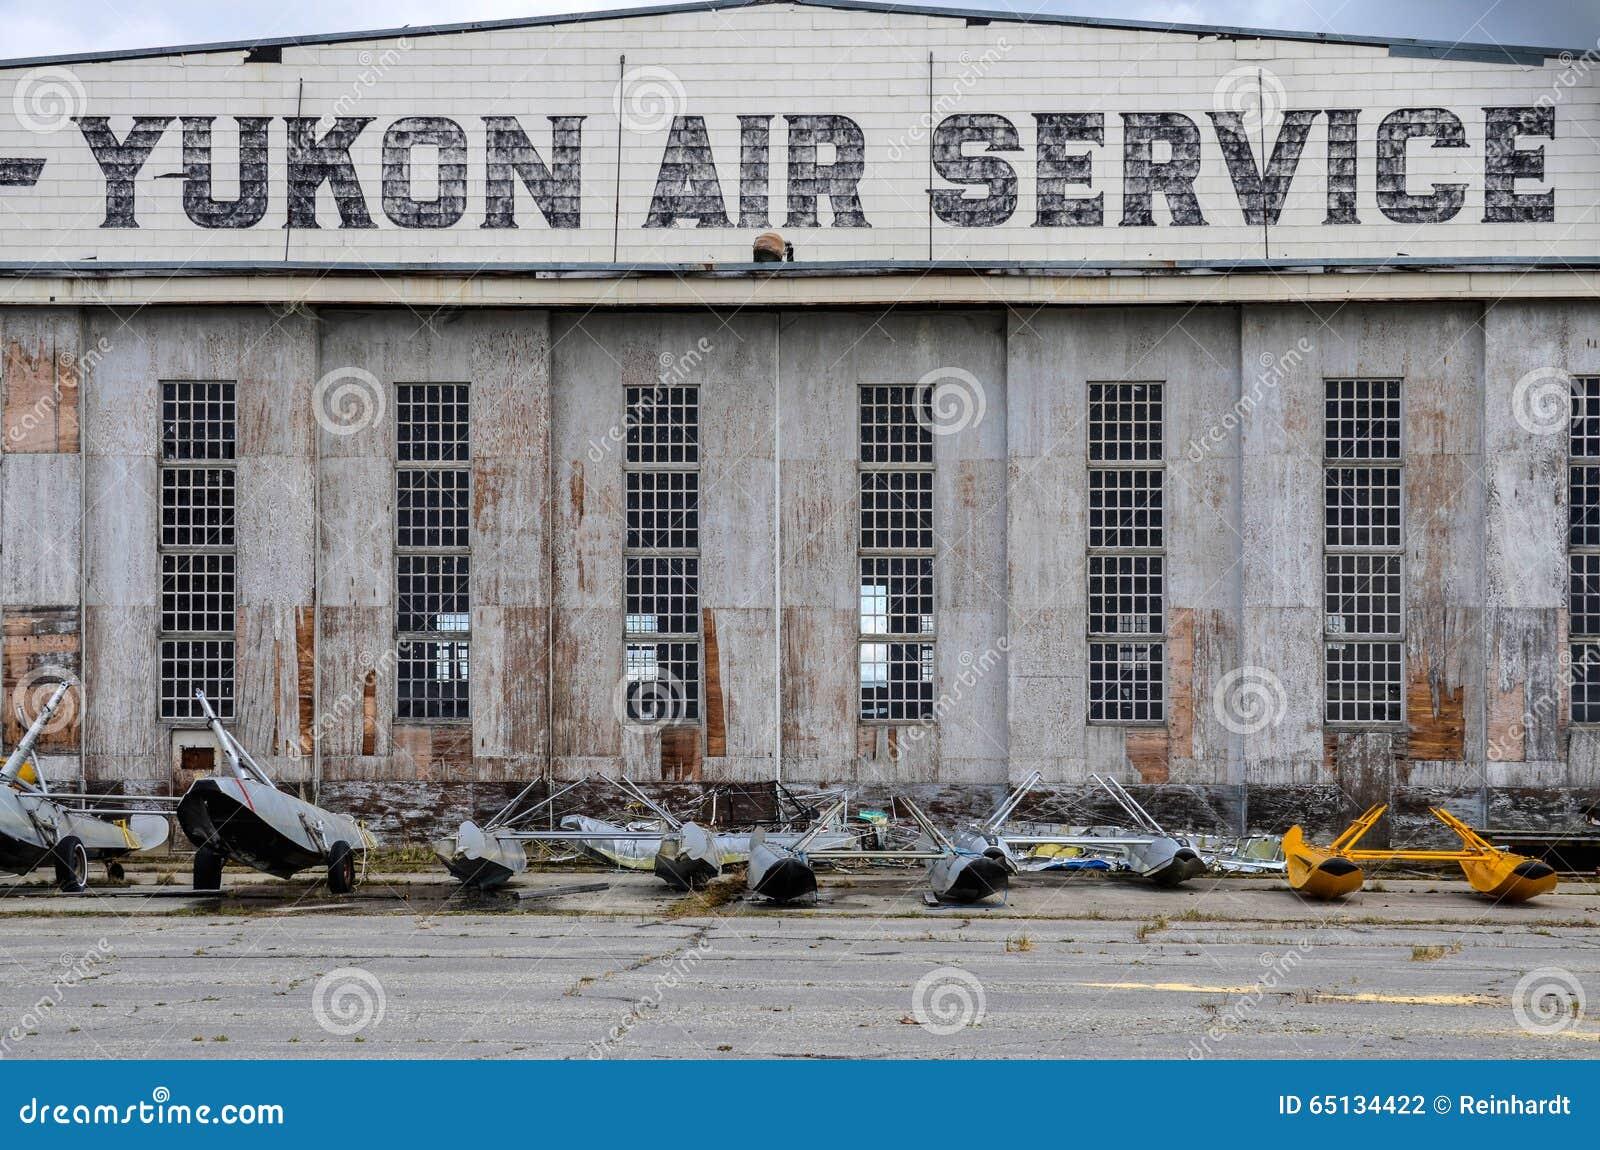 Watson Lake, Canada, historic airport hangar